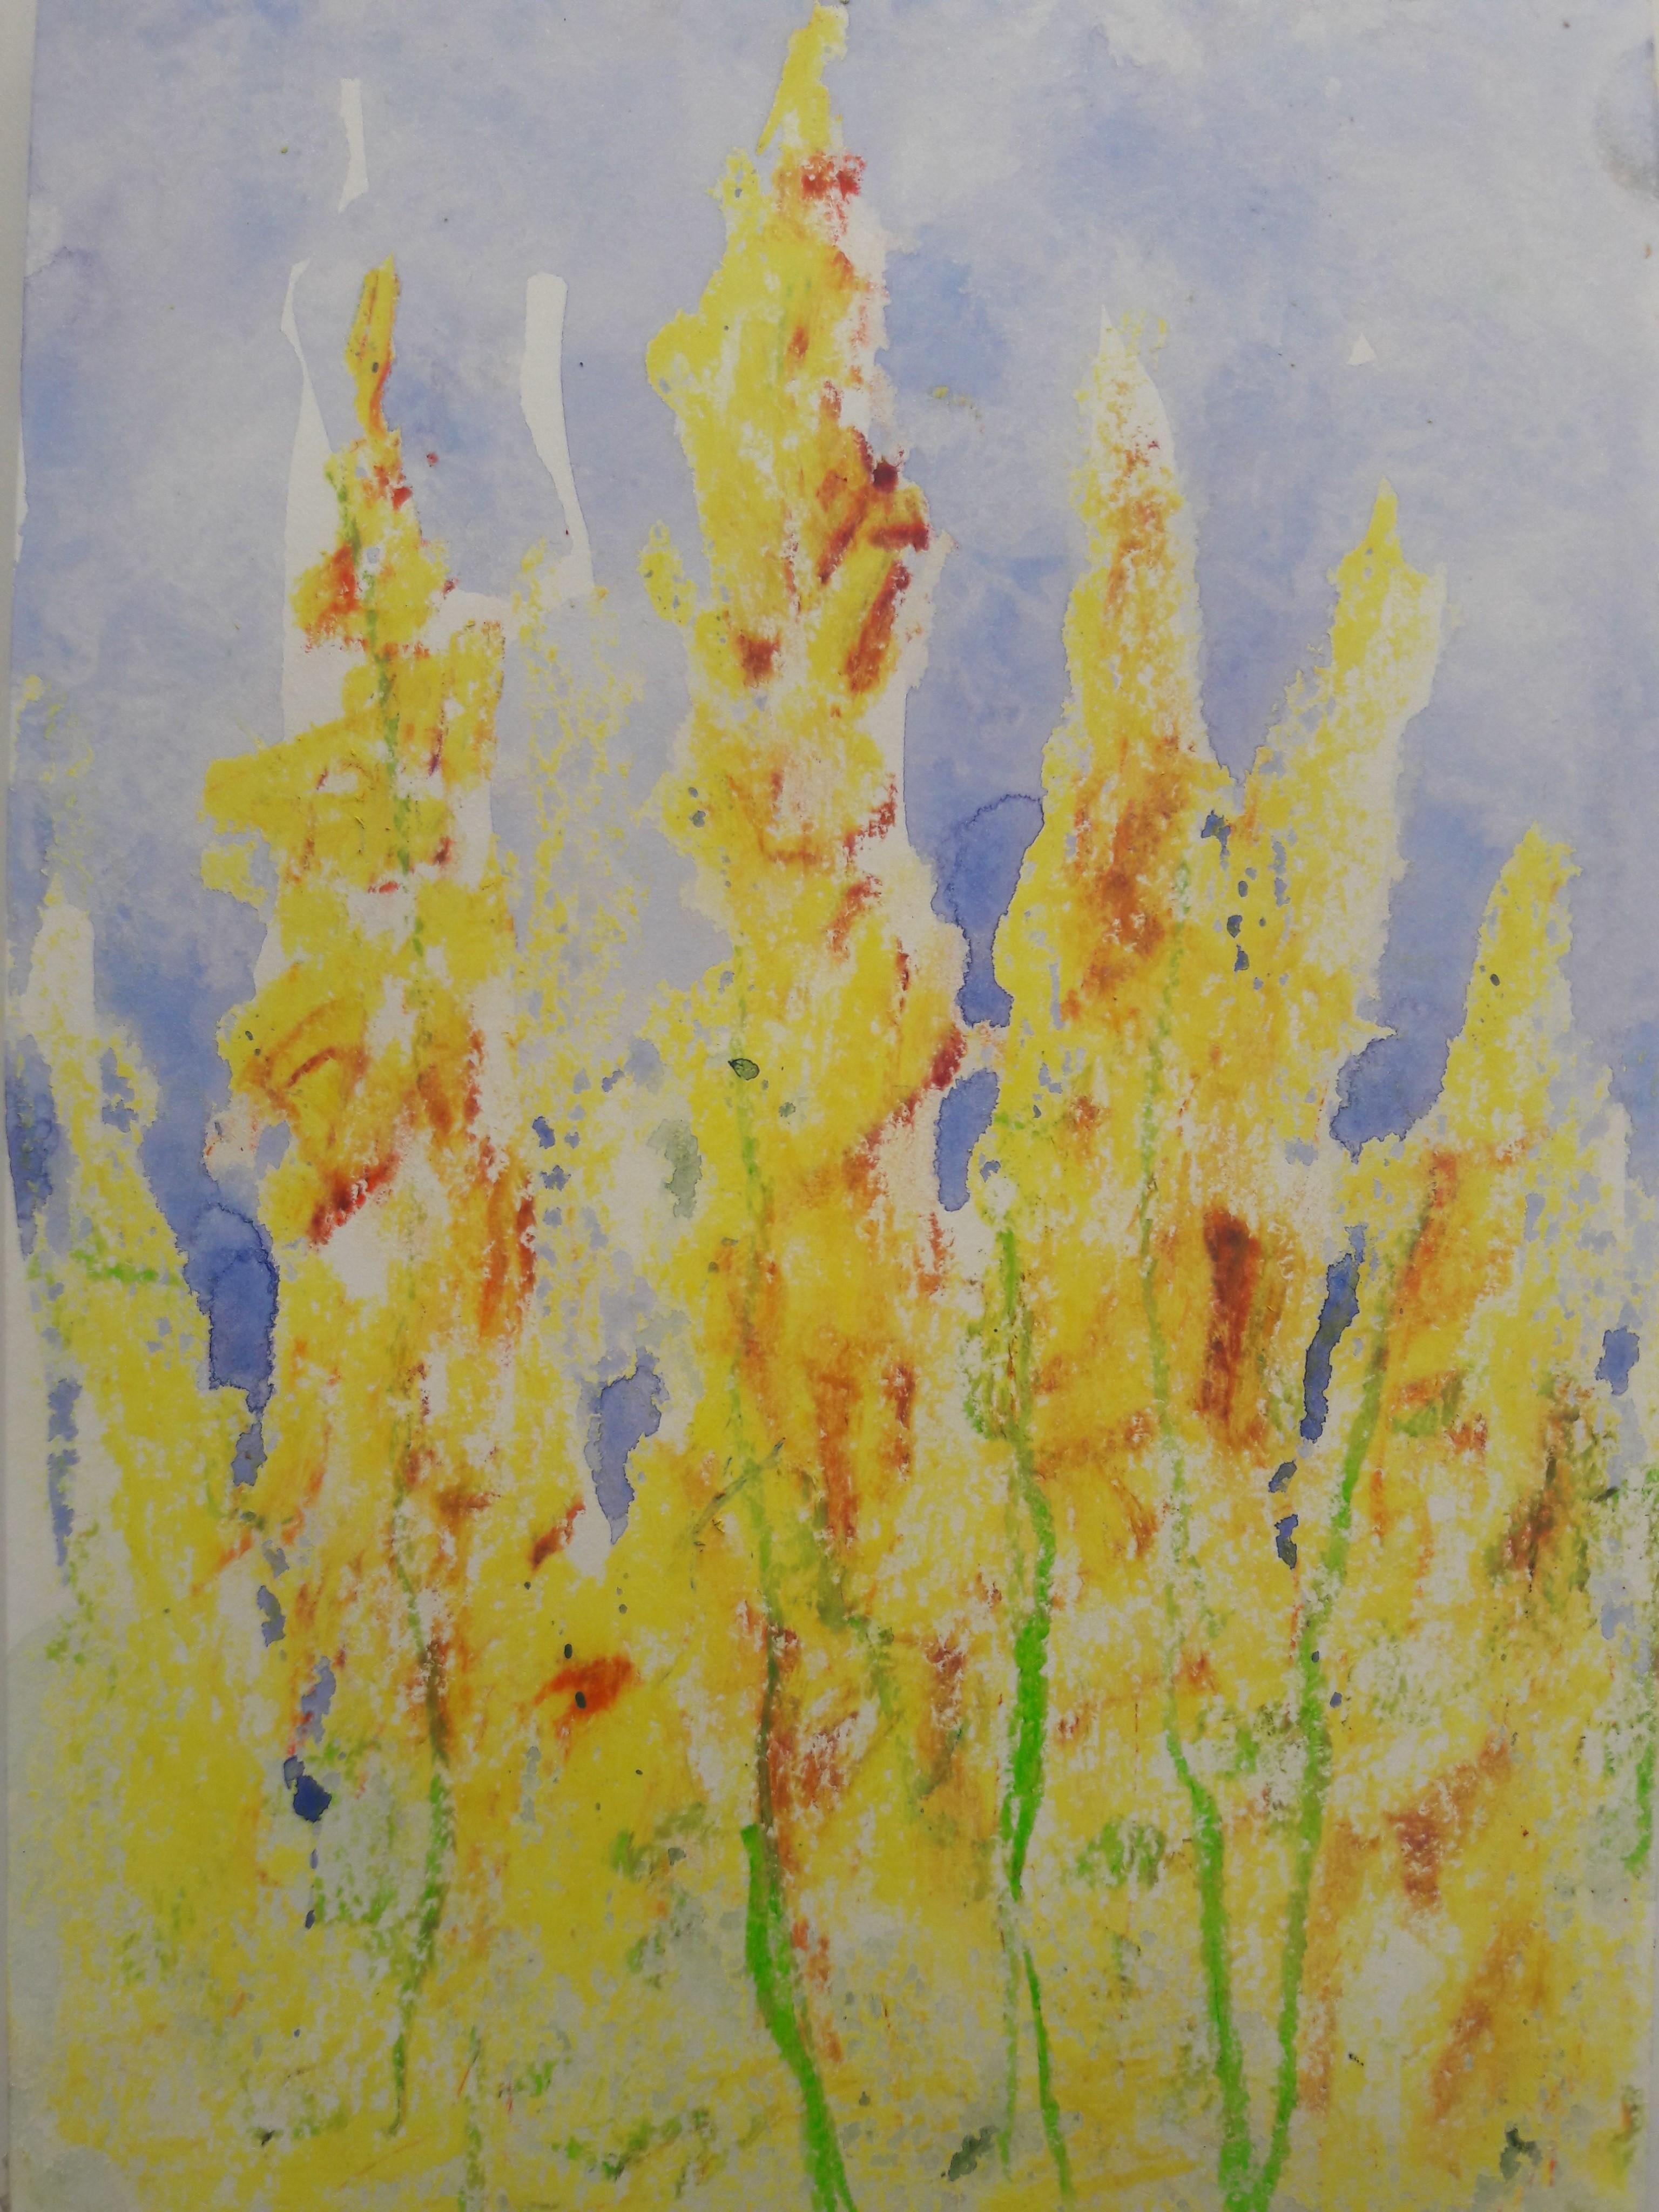 Tekening gele bloemen